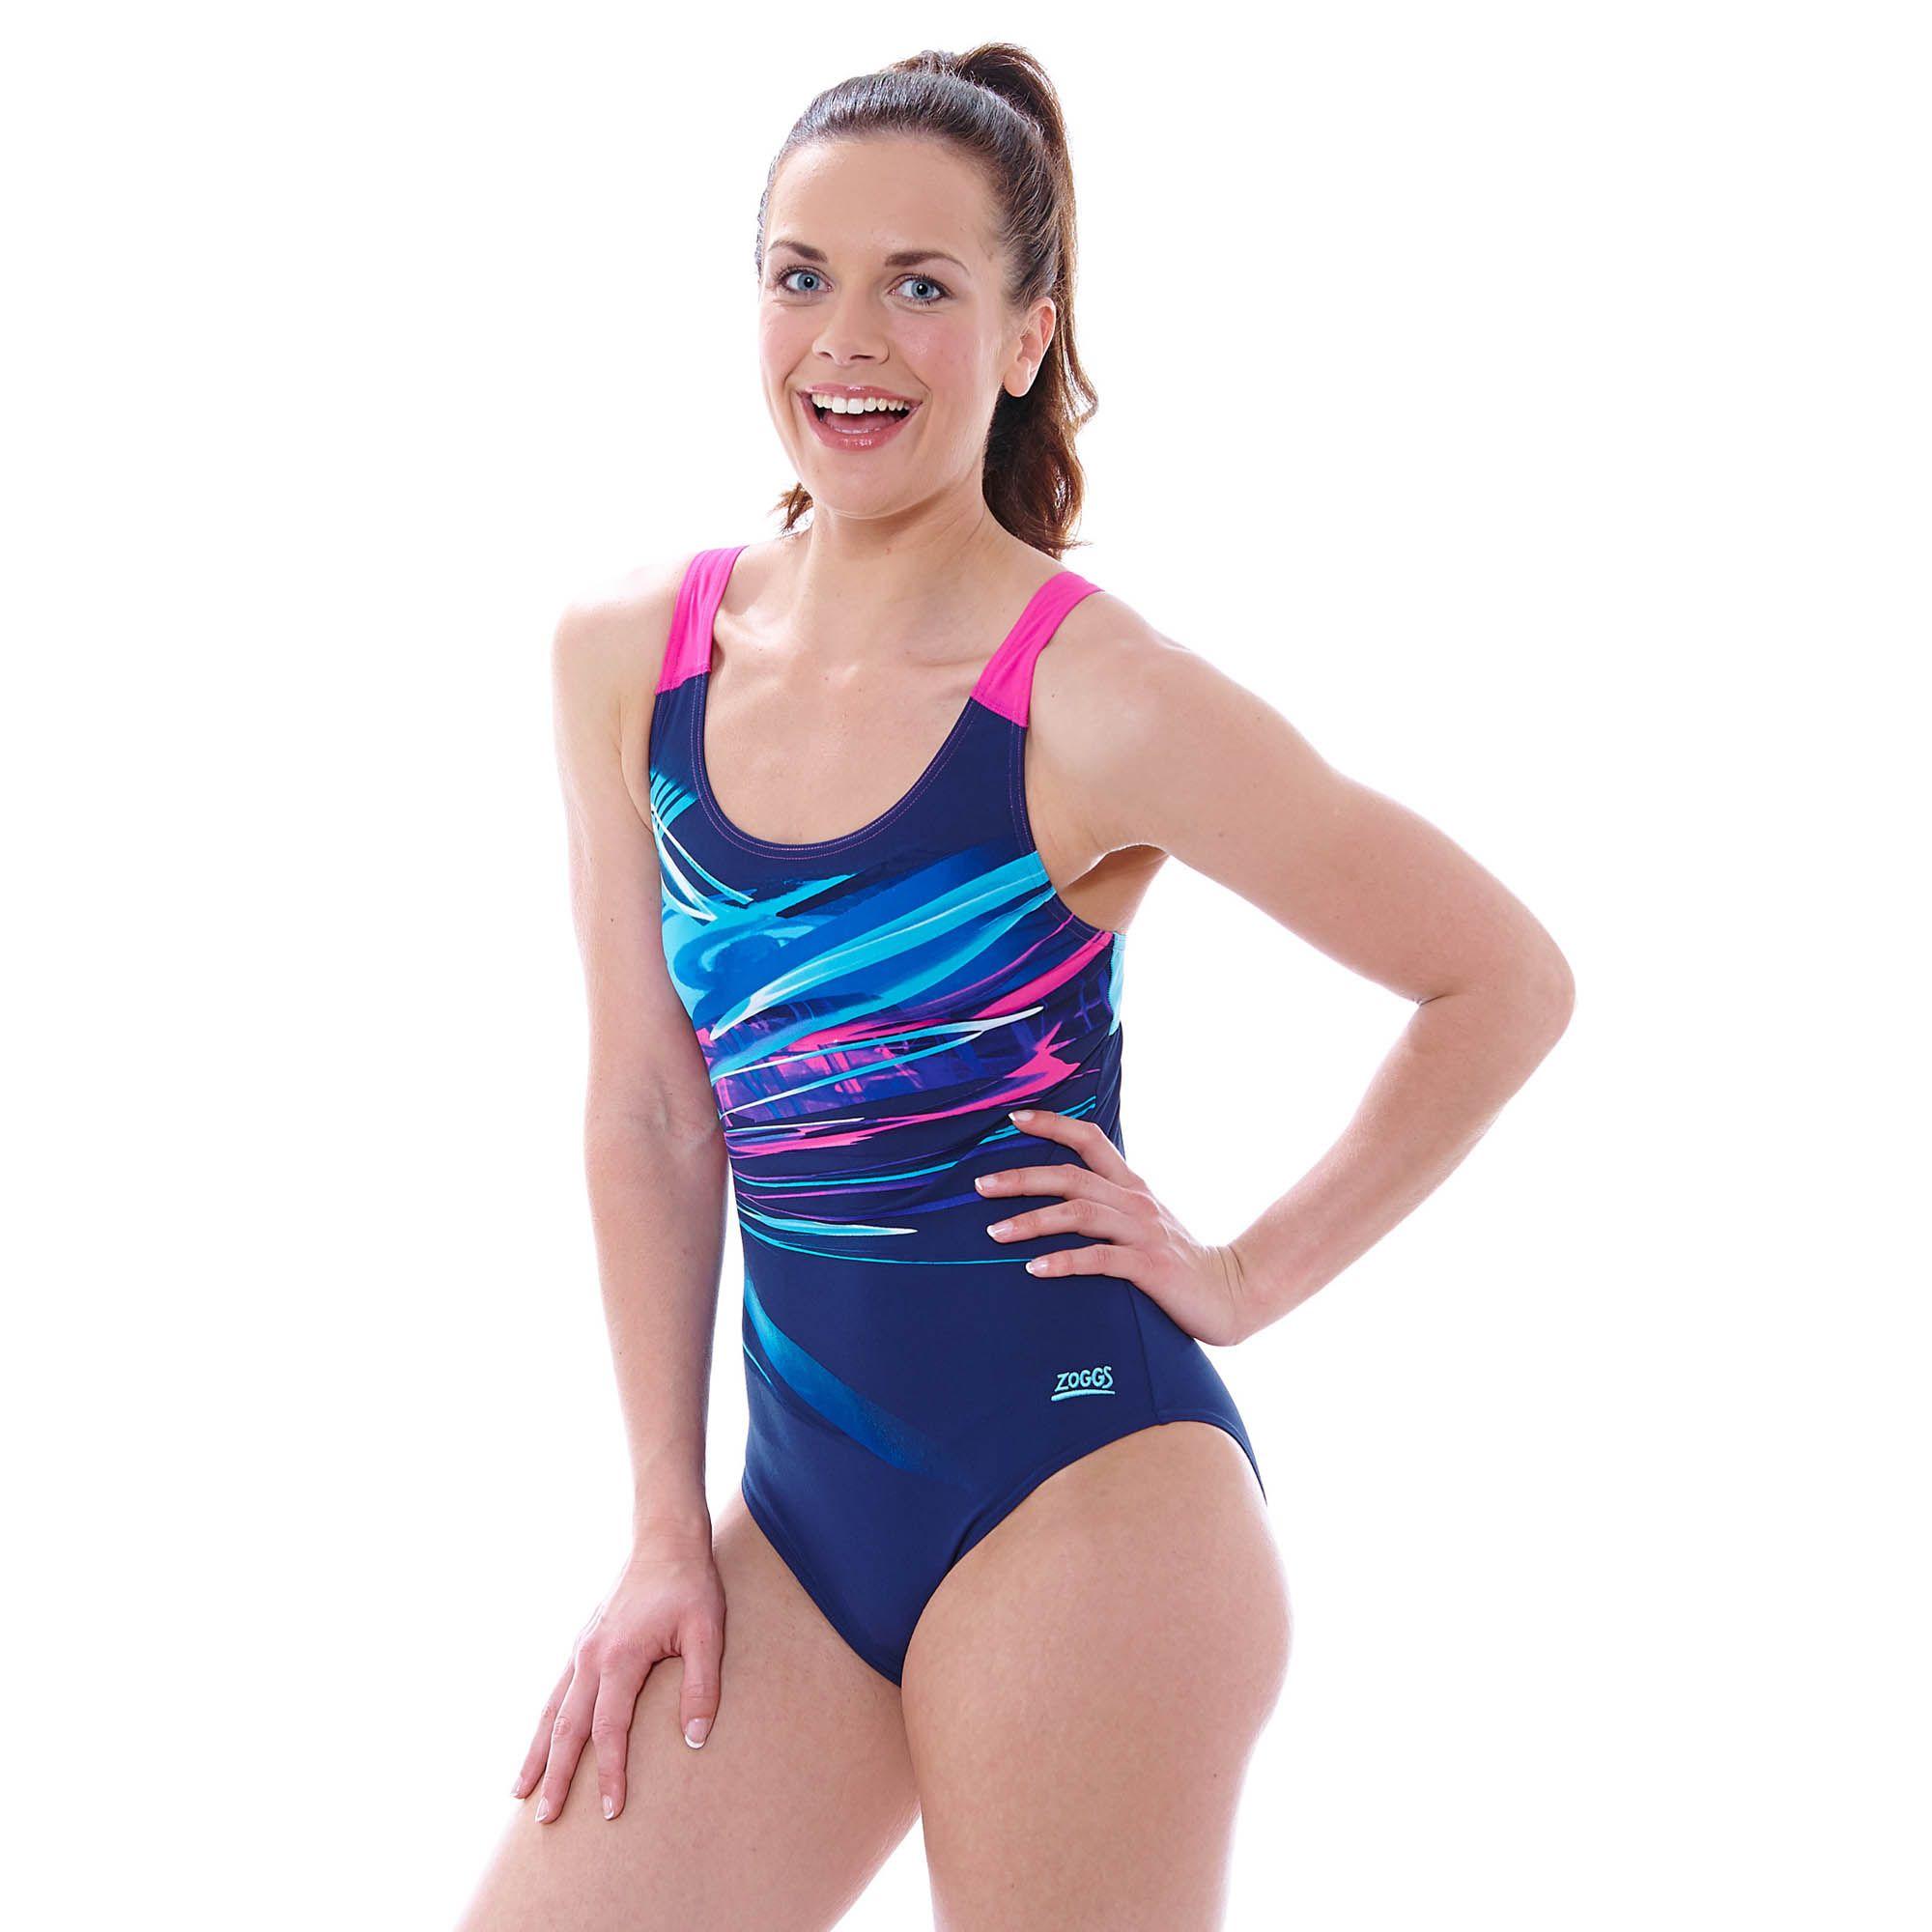 Zoggs Aurora Speedback Ladies Swimsuit Sweatband Com